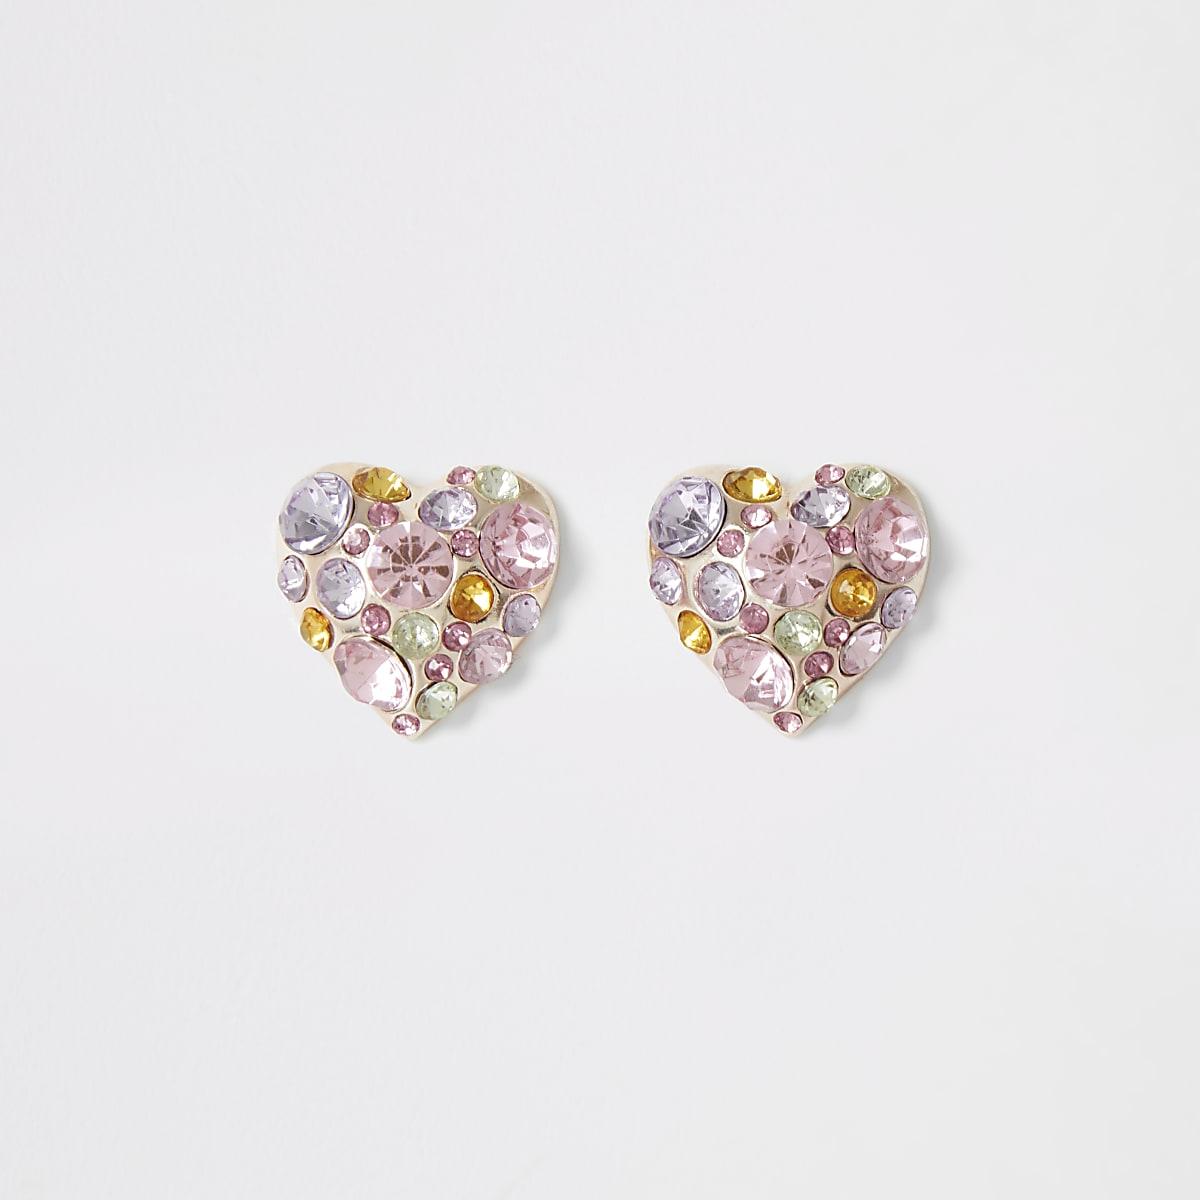 Rose gold embellished heart stud earrings